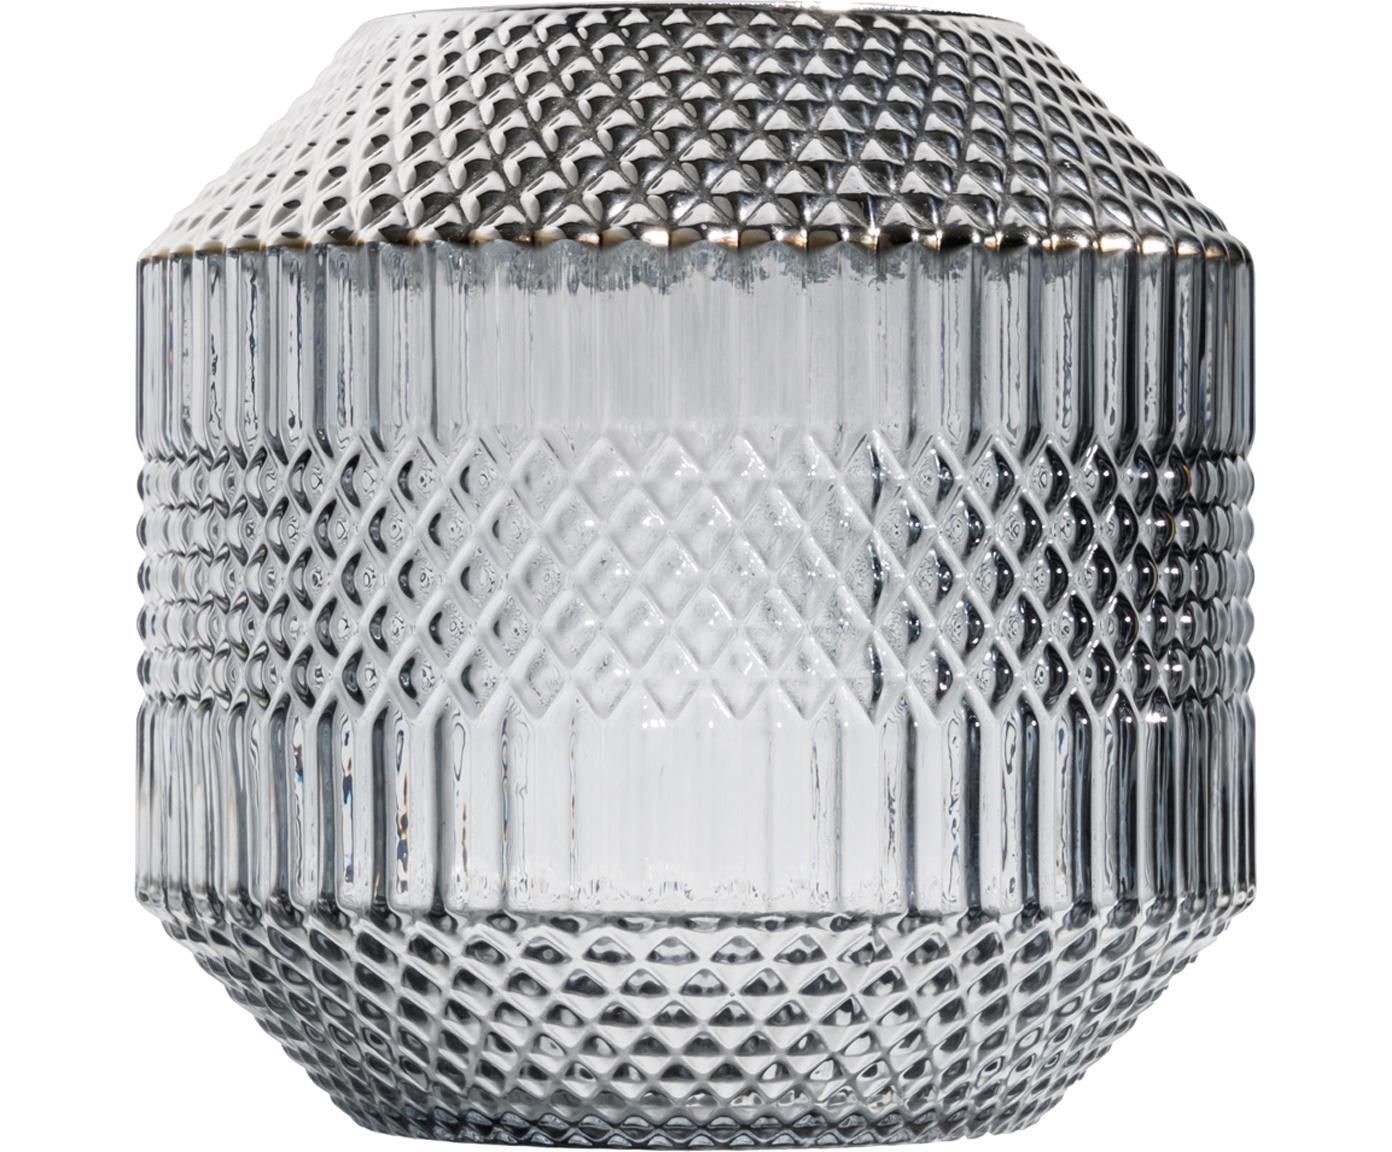 Jarrón de vidrio Dolin, Vidrio, metal, Gris, transparente, plateado, Ø 20 x Al 20 cm